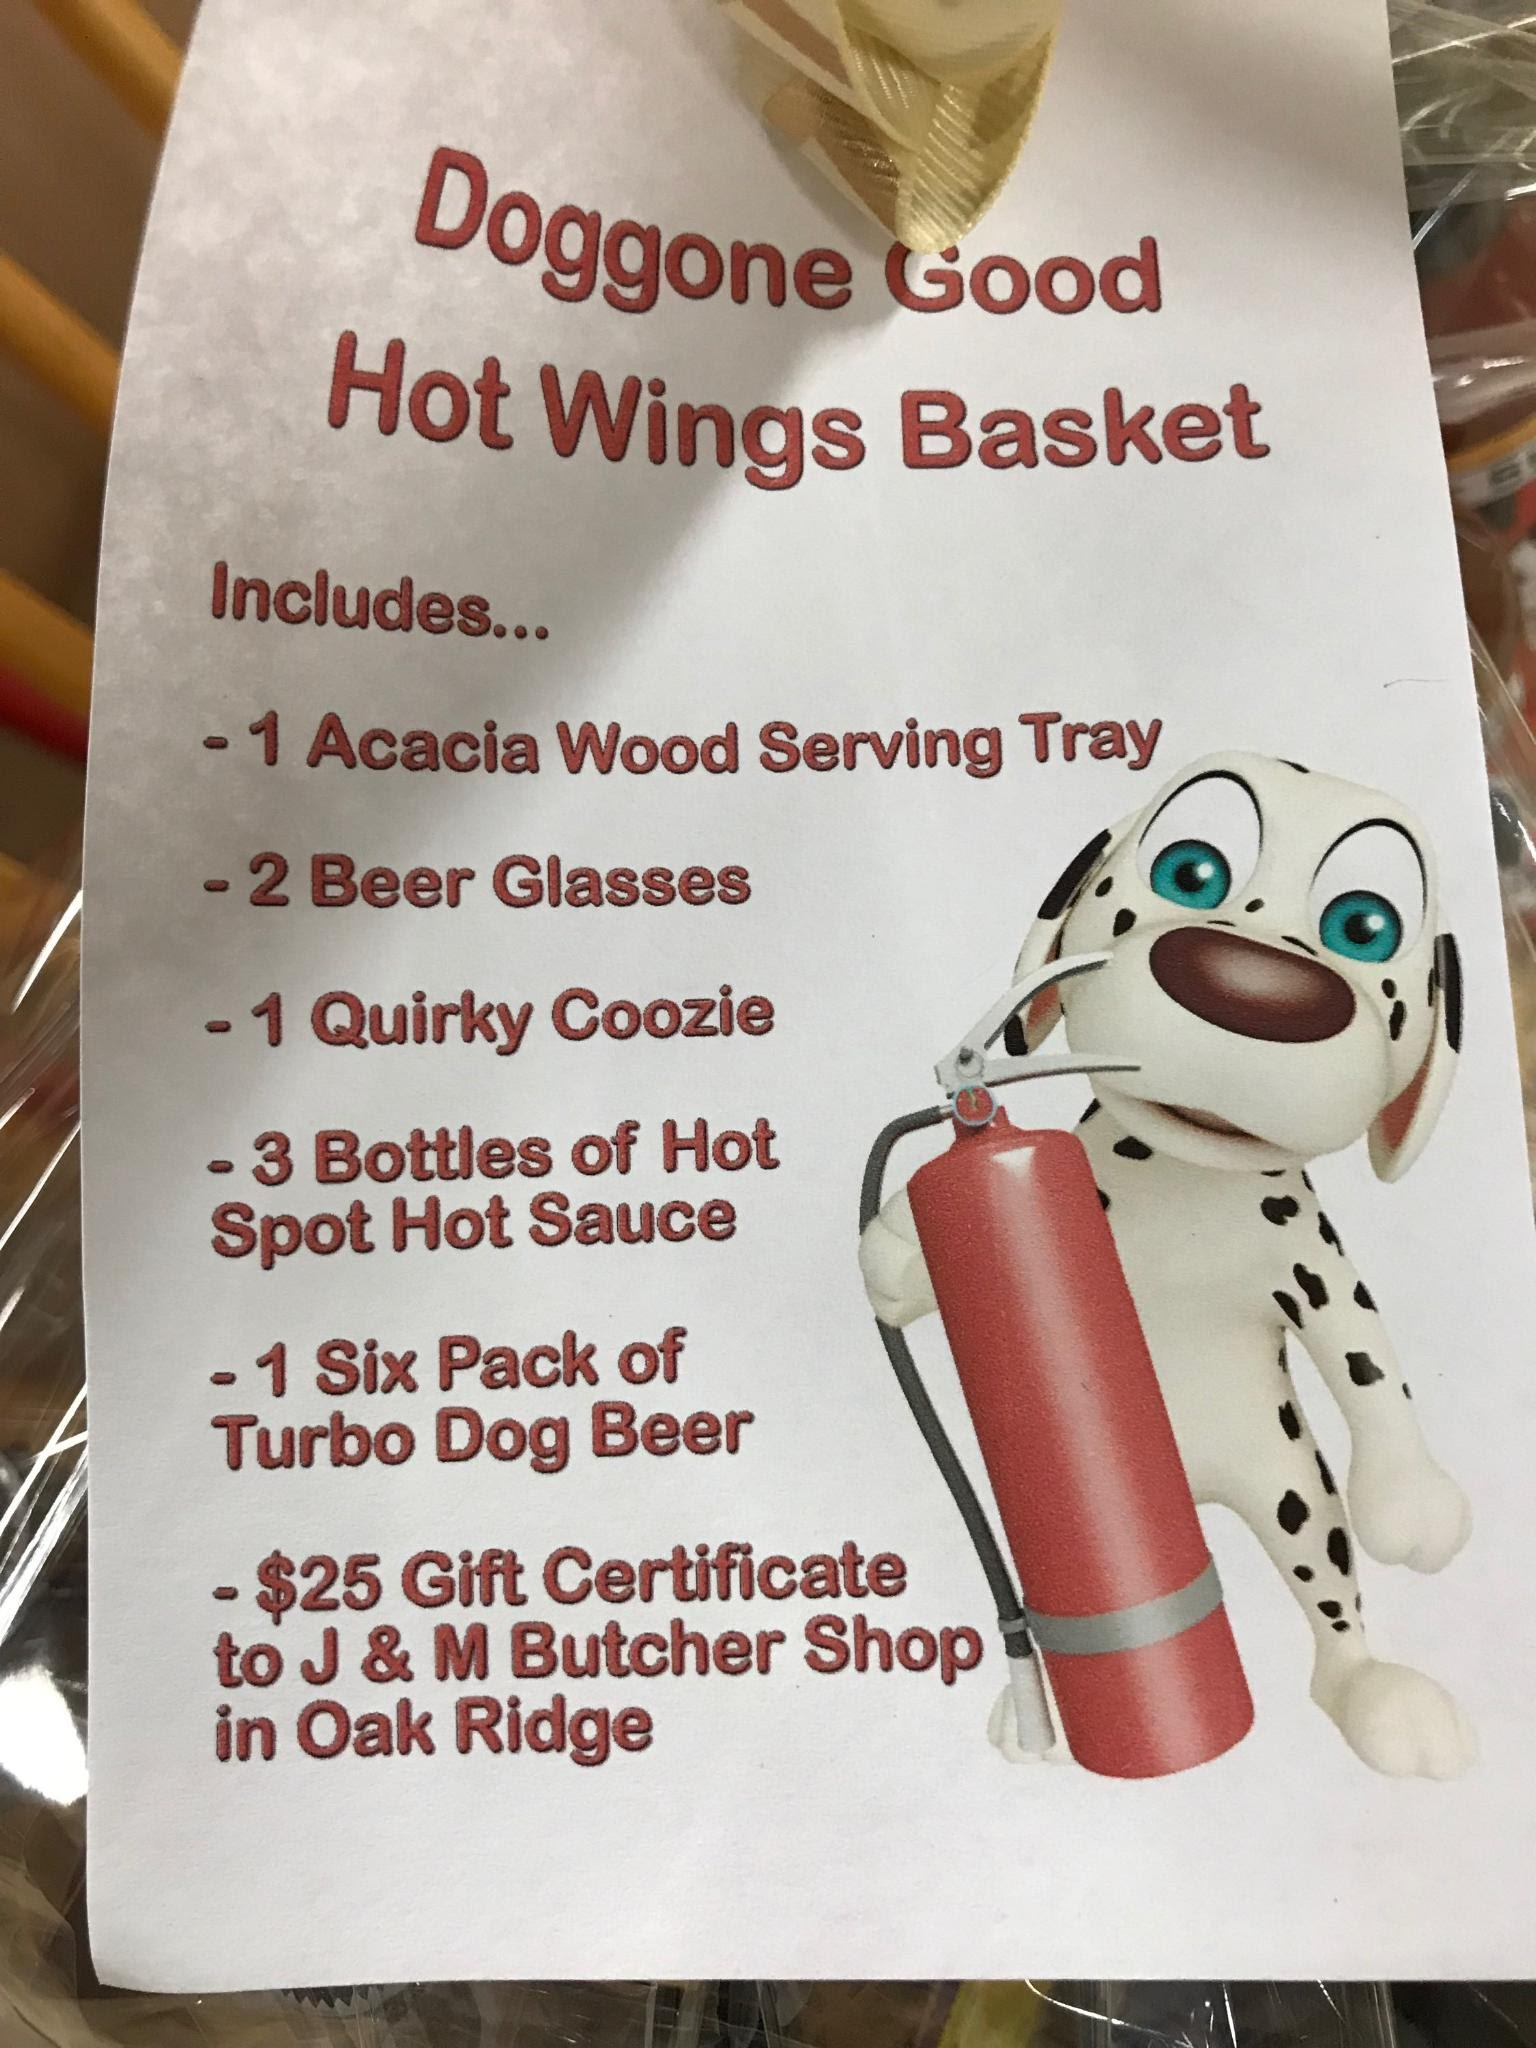 Doggone Good Hot Wings Basket